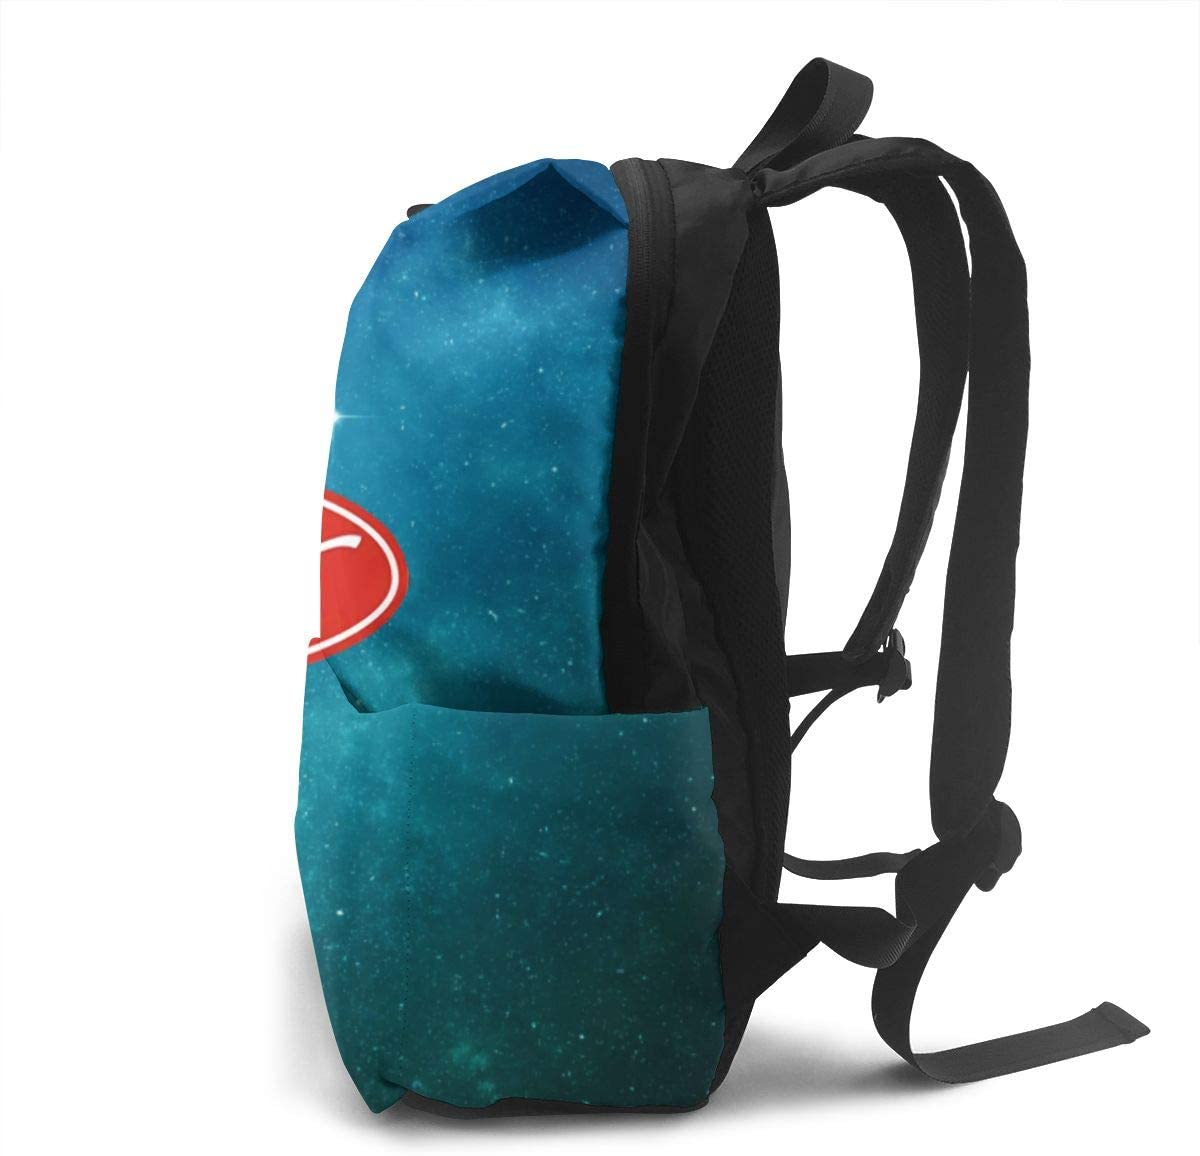 Veta Megica Peterbilt Student Bag Bookbag Backpack Laptop Bag